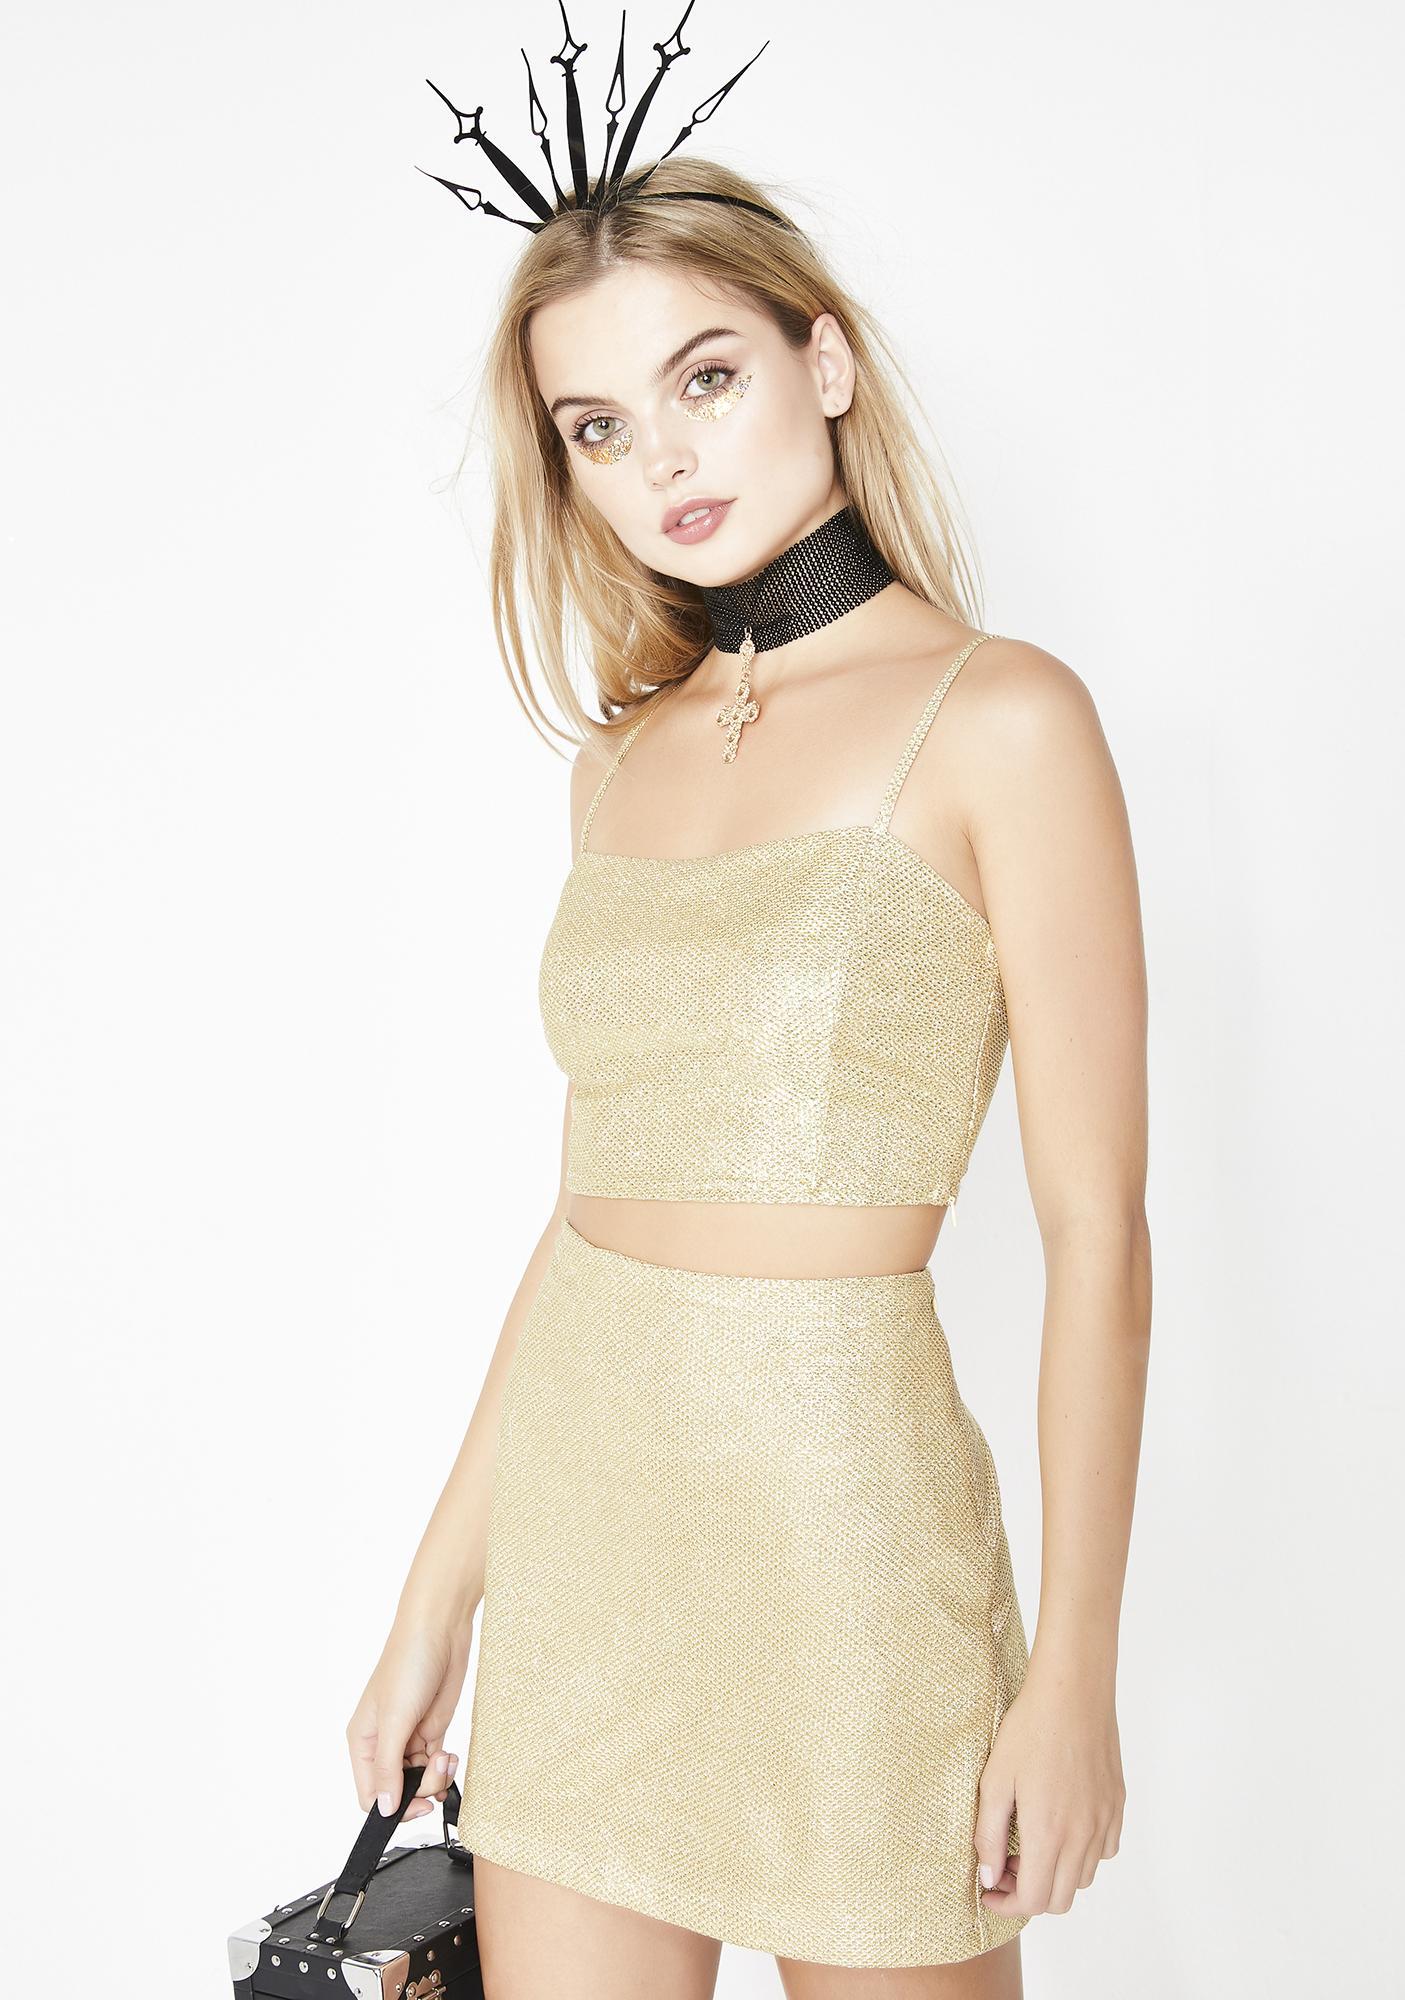 Midas Touch Mini Skirt